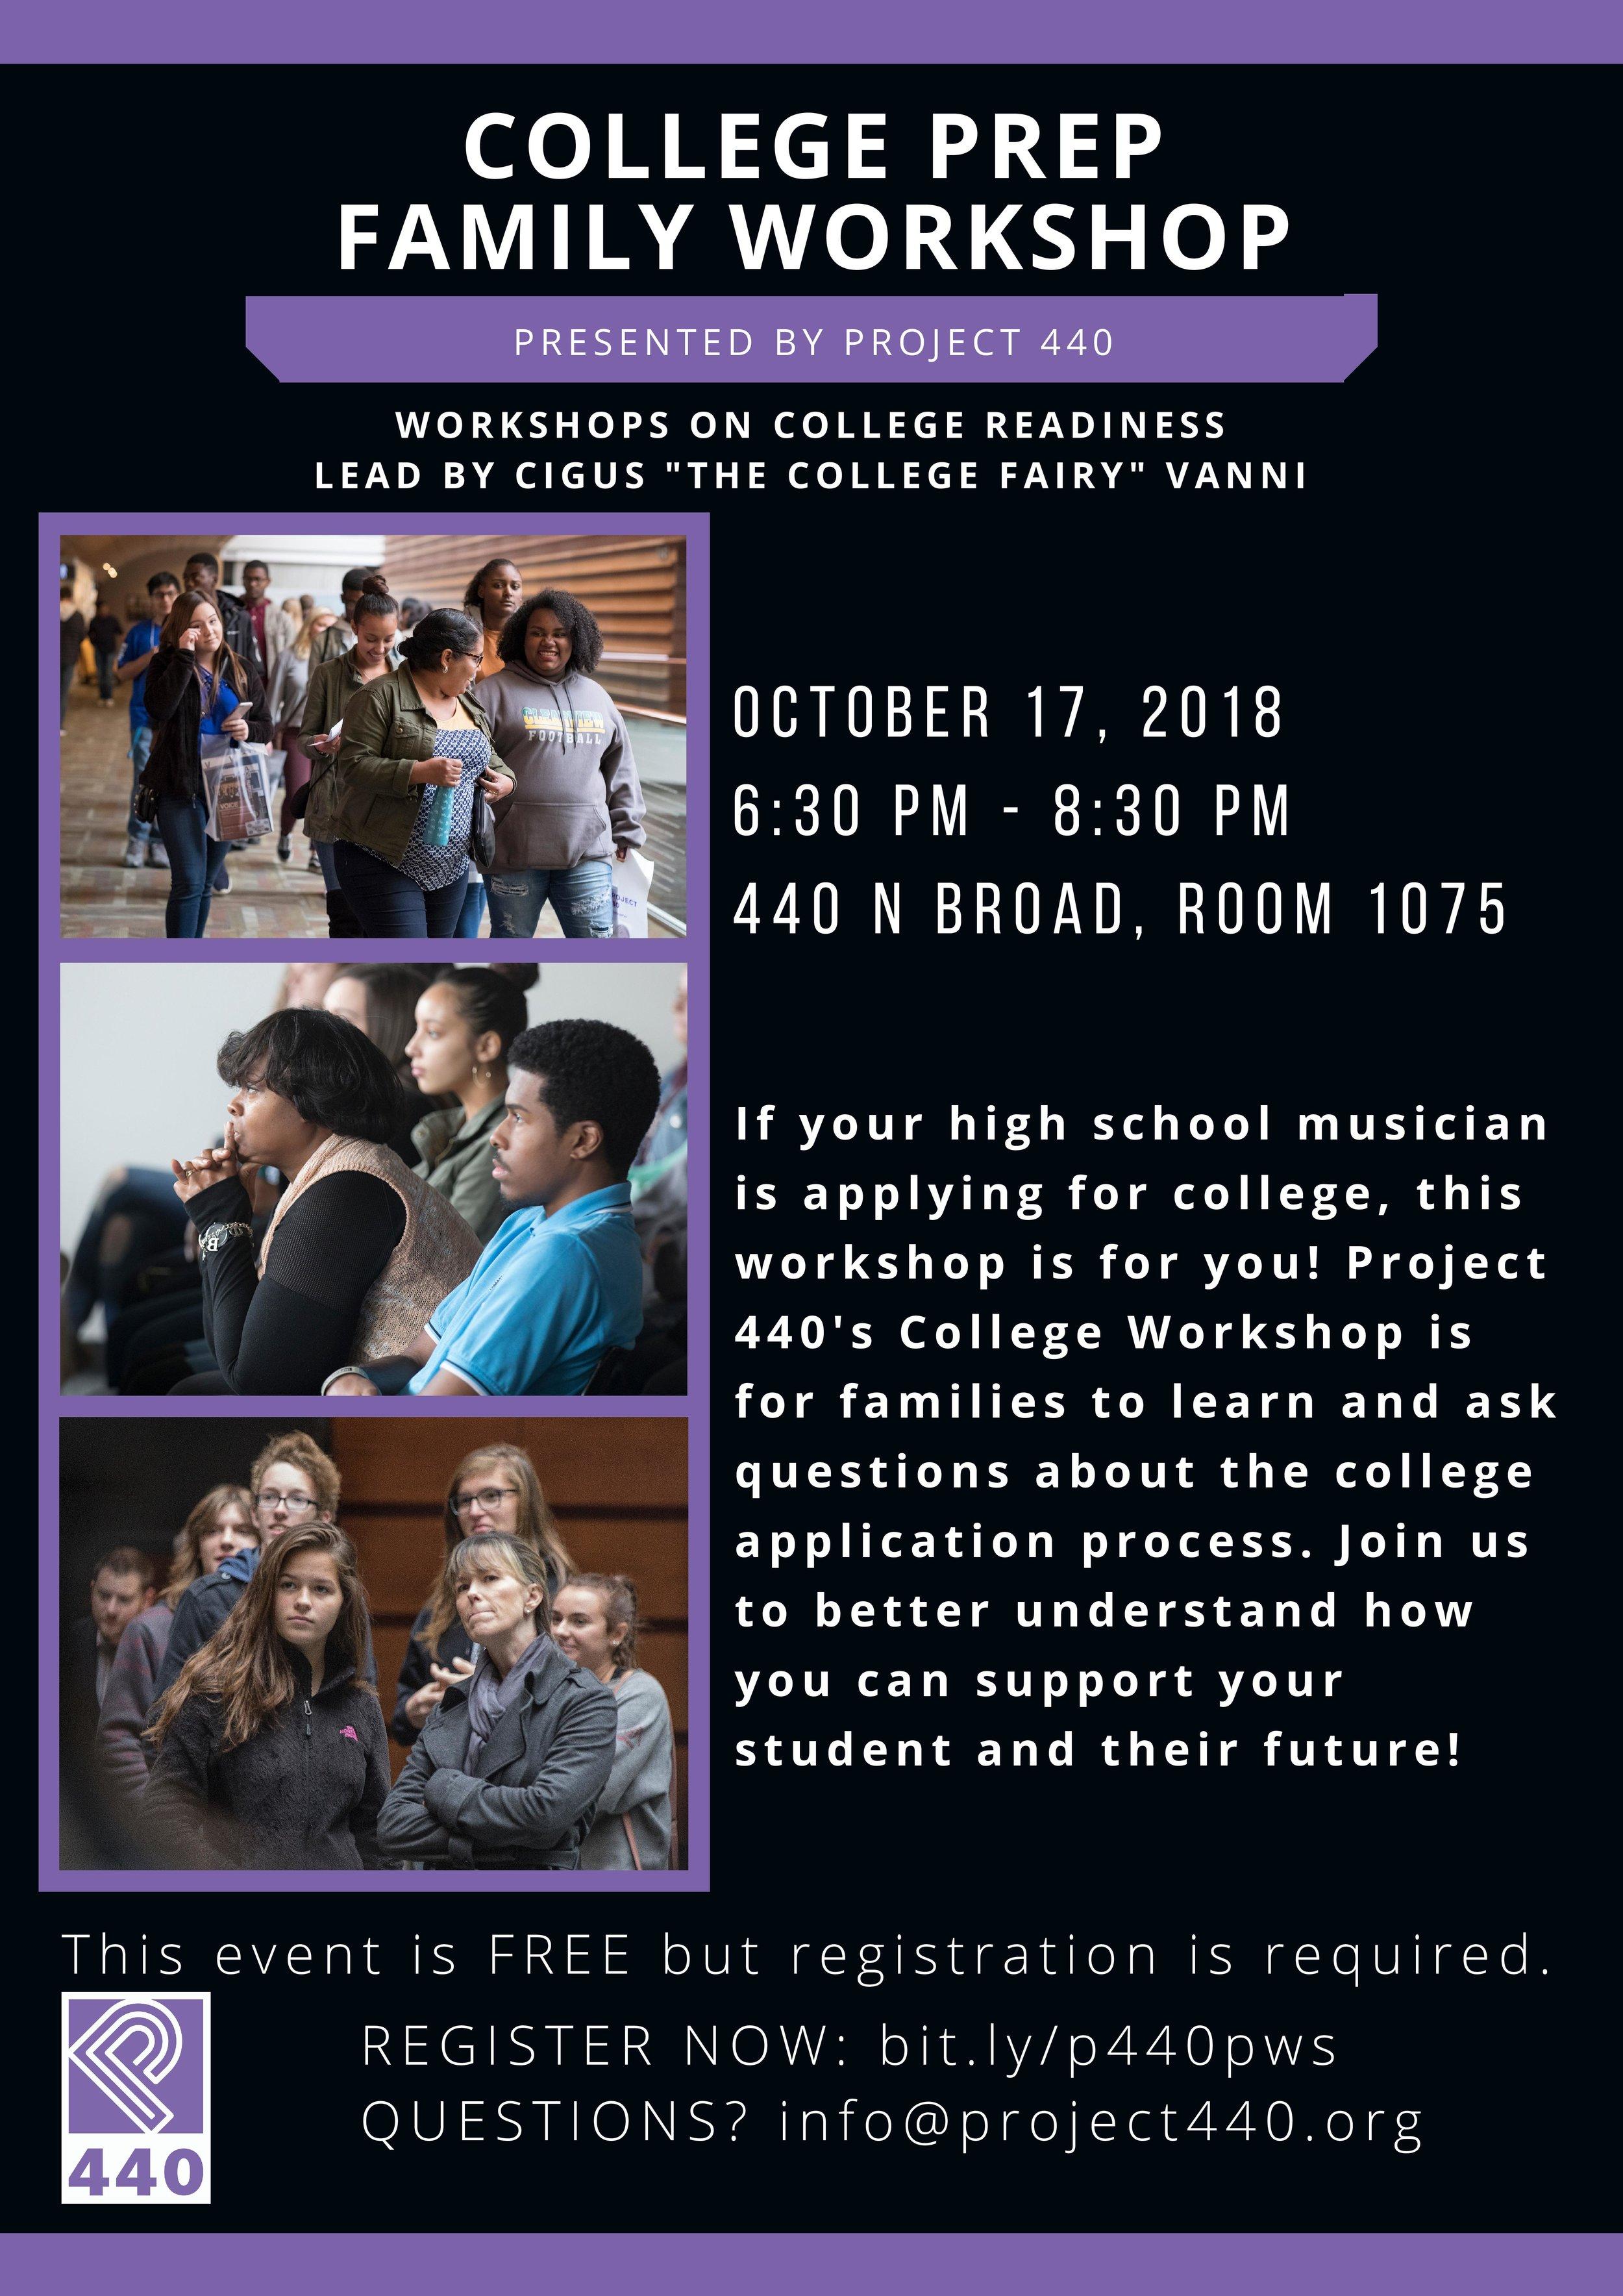 2018.10.17 - Project 440 College Prep Flyer.jpg